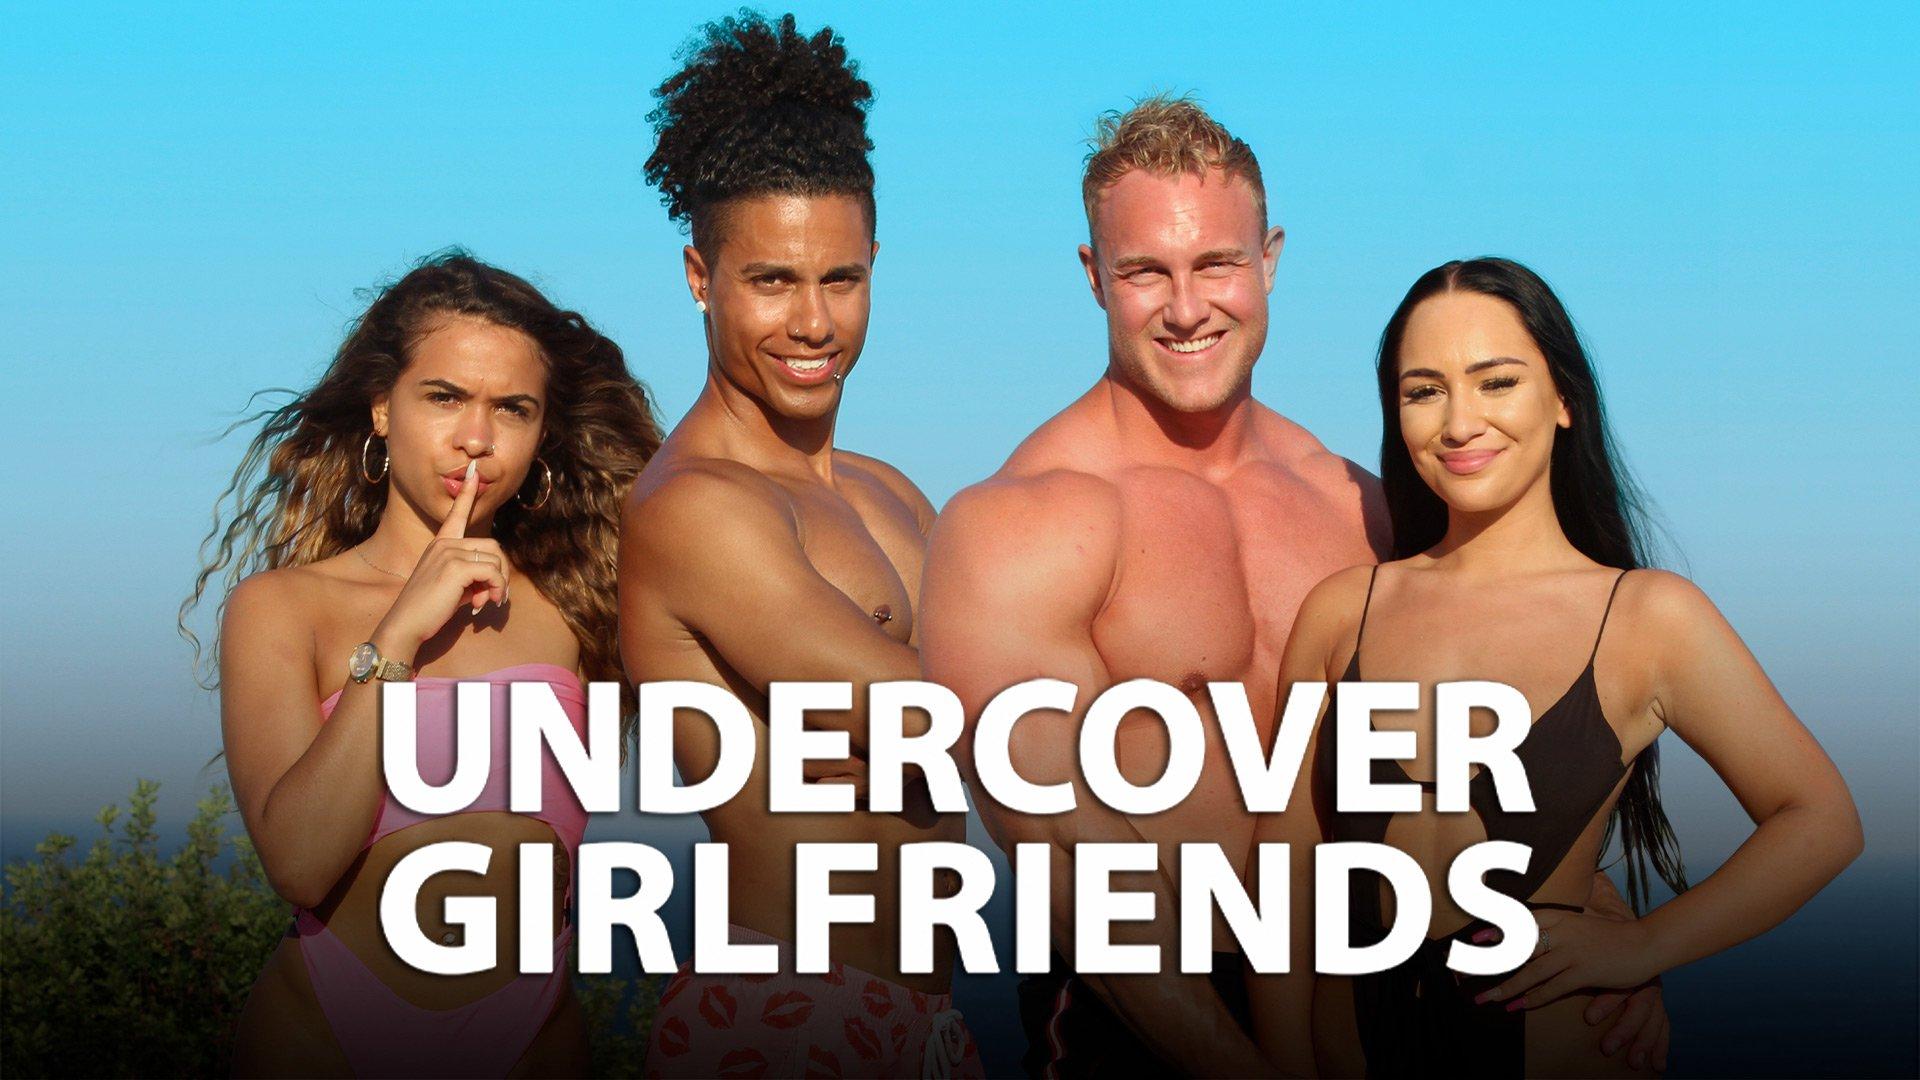 Undercover Girlfriends on BritBox UK